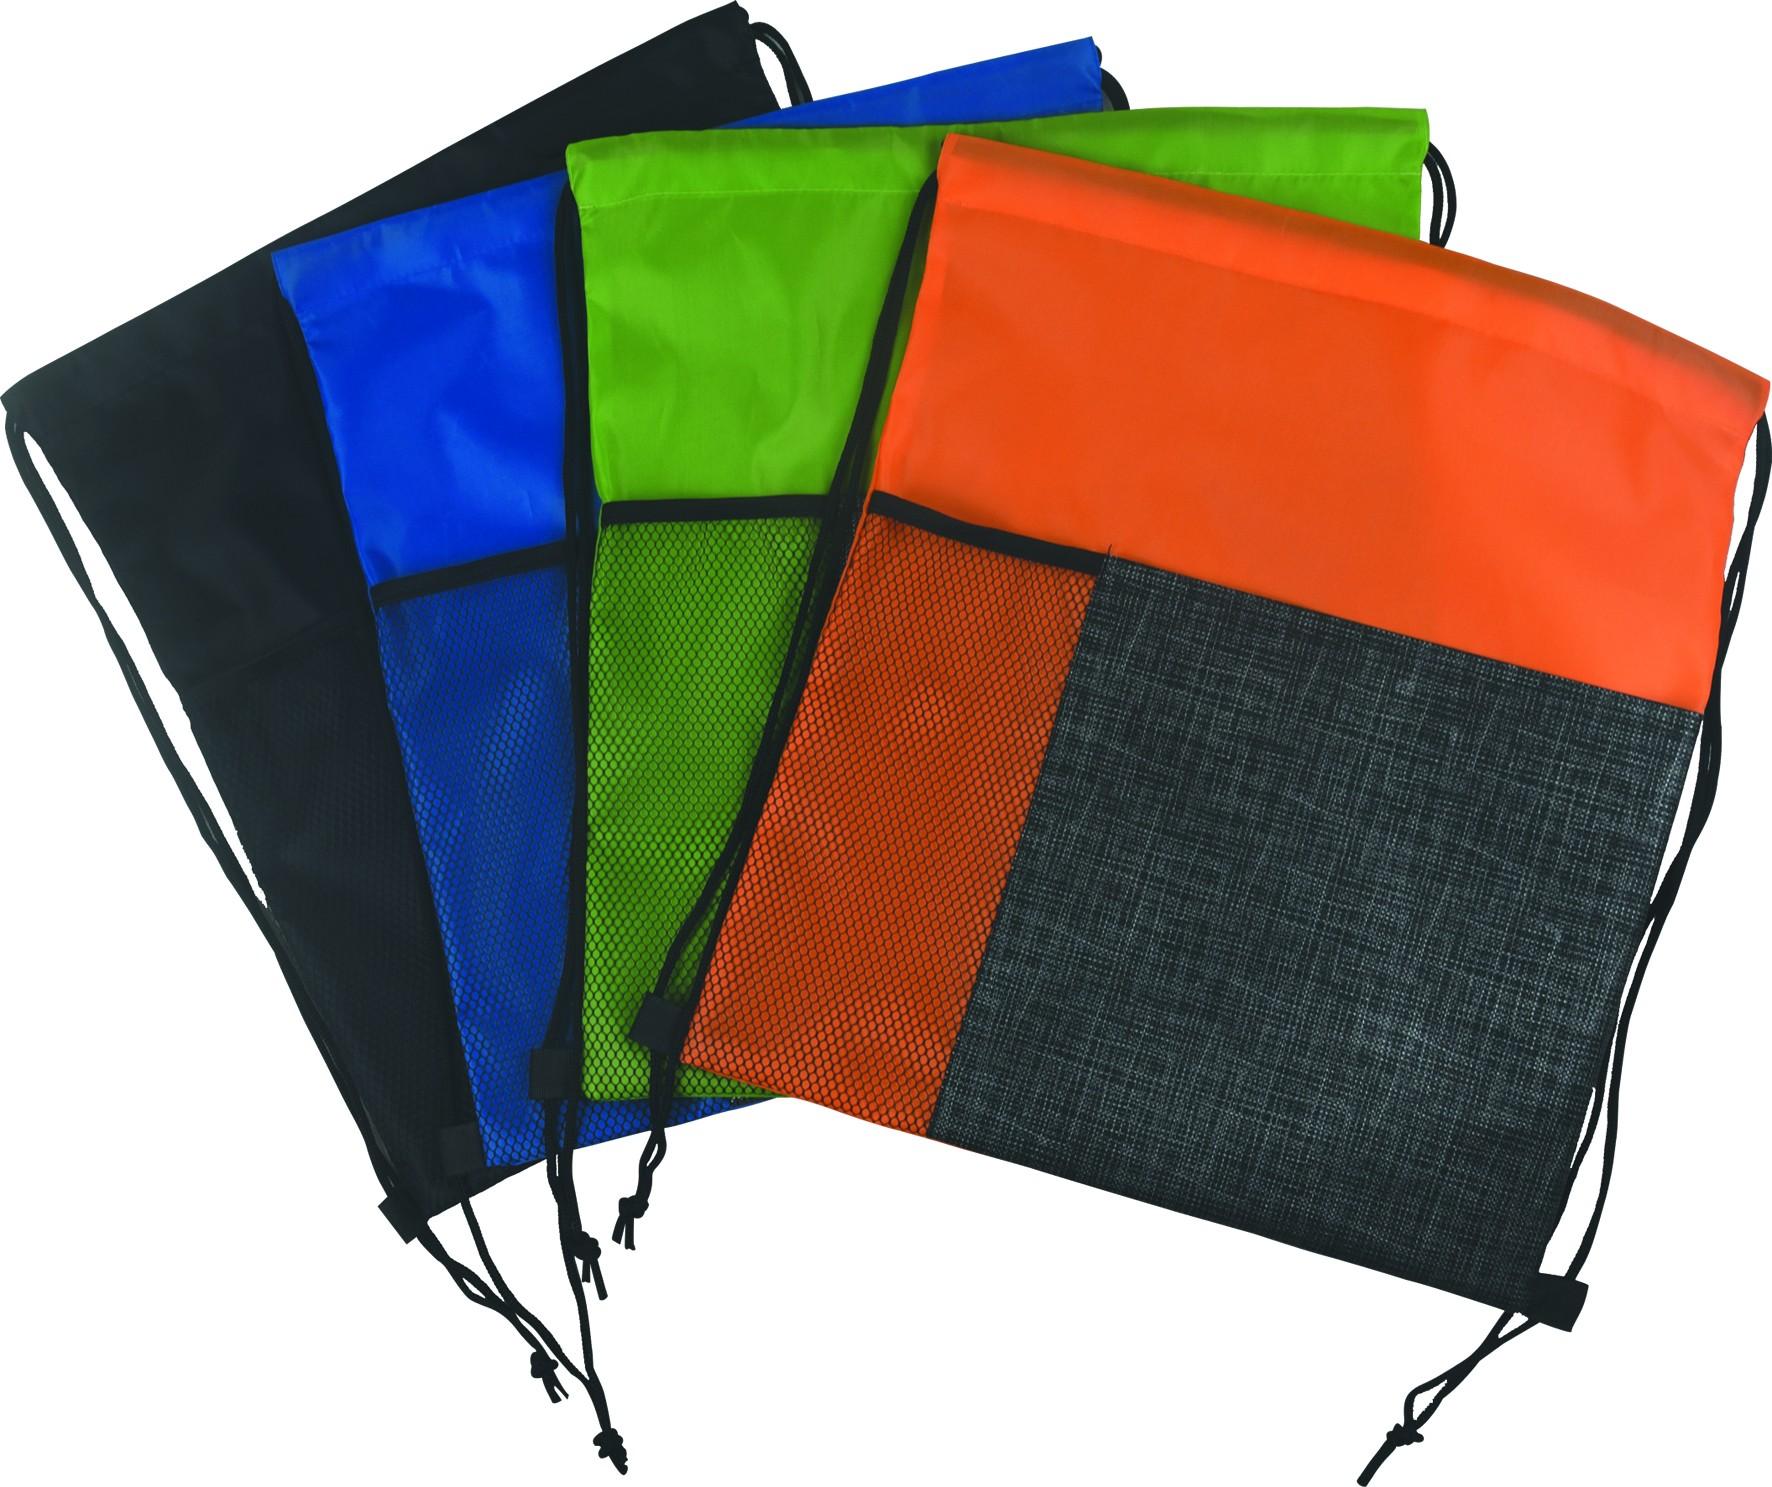 Buy Non Woven Package Bag, Non Woven Bag Fabric Manufacturer, Red Non Woven Bag Quotes